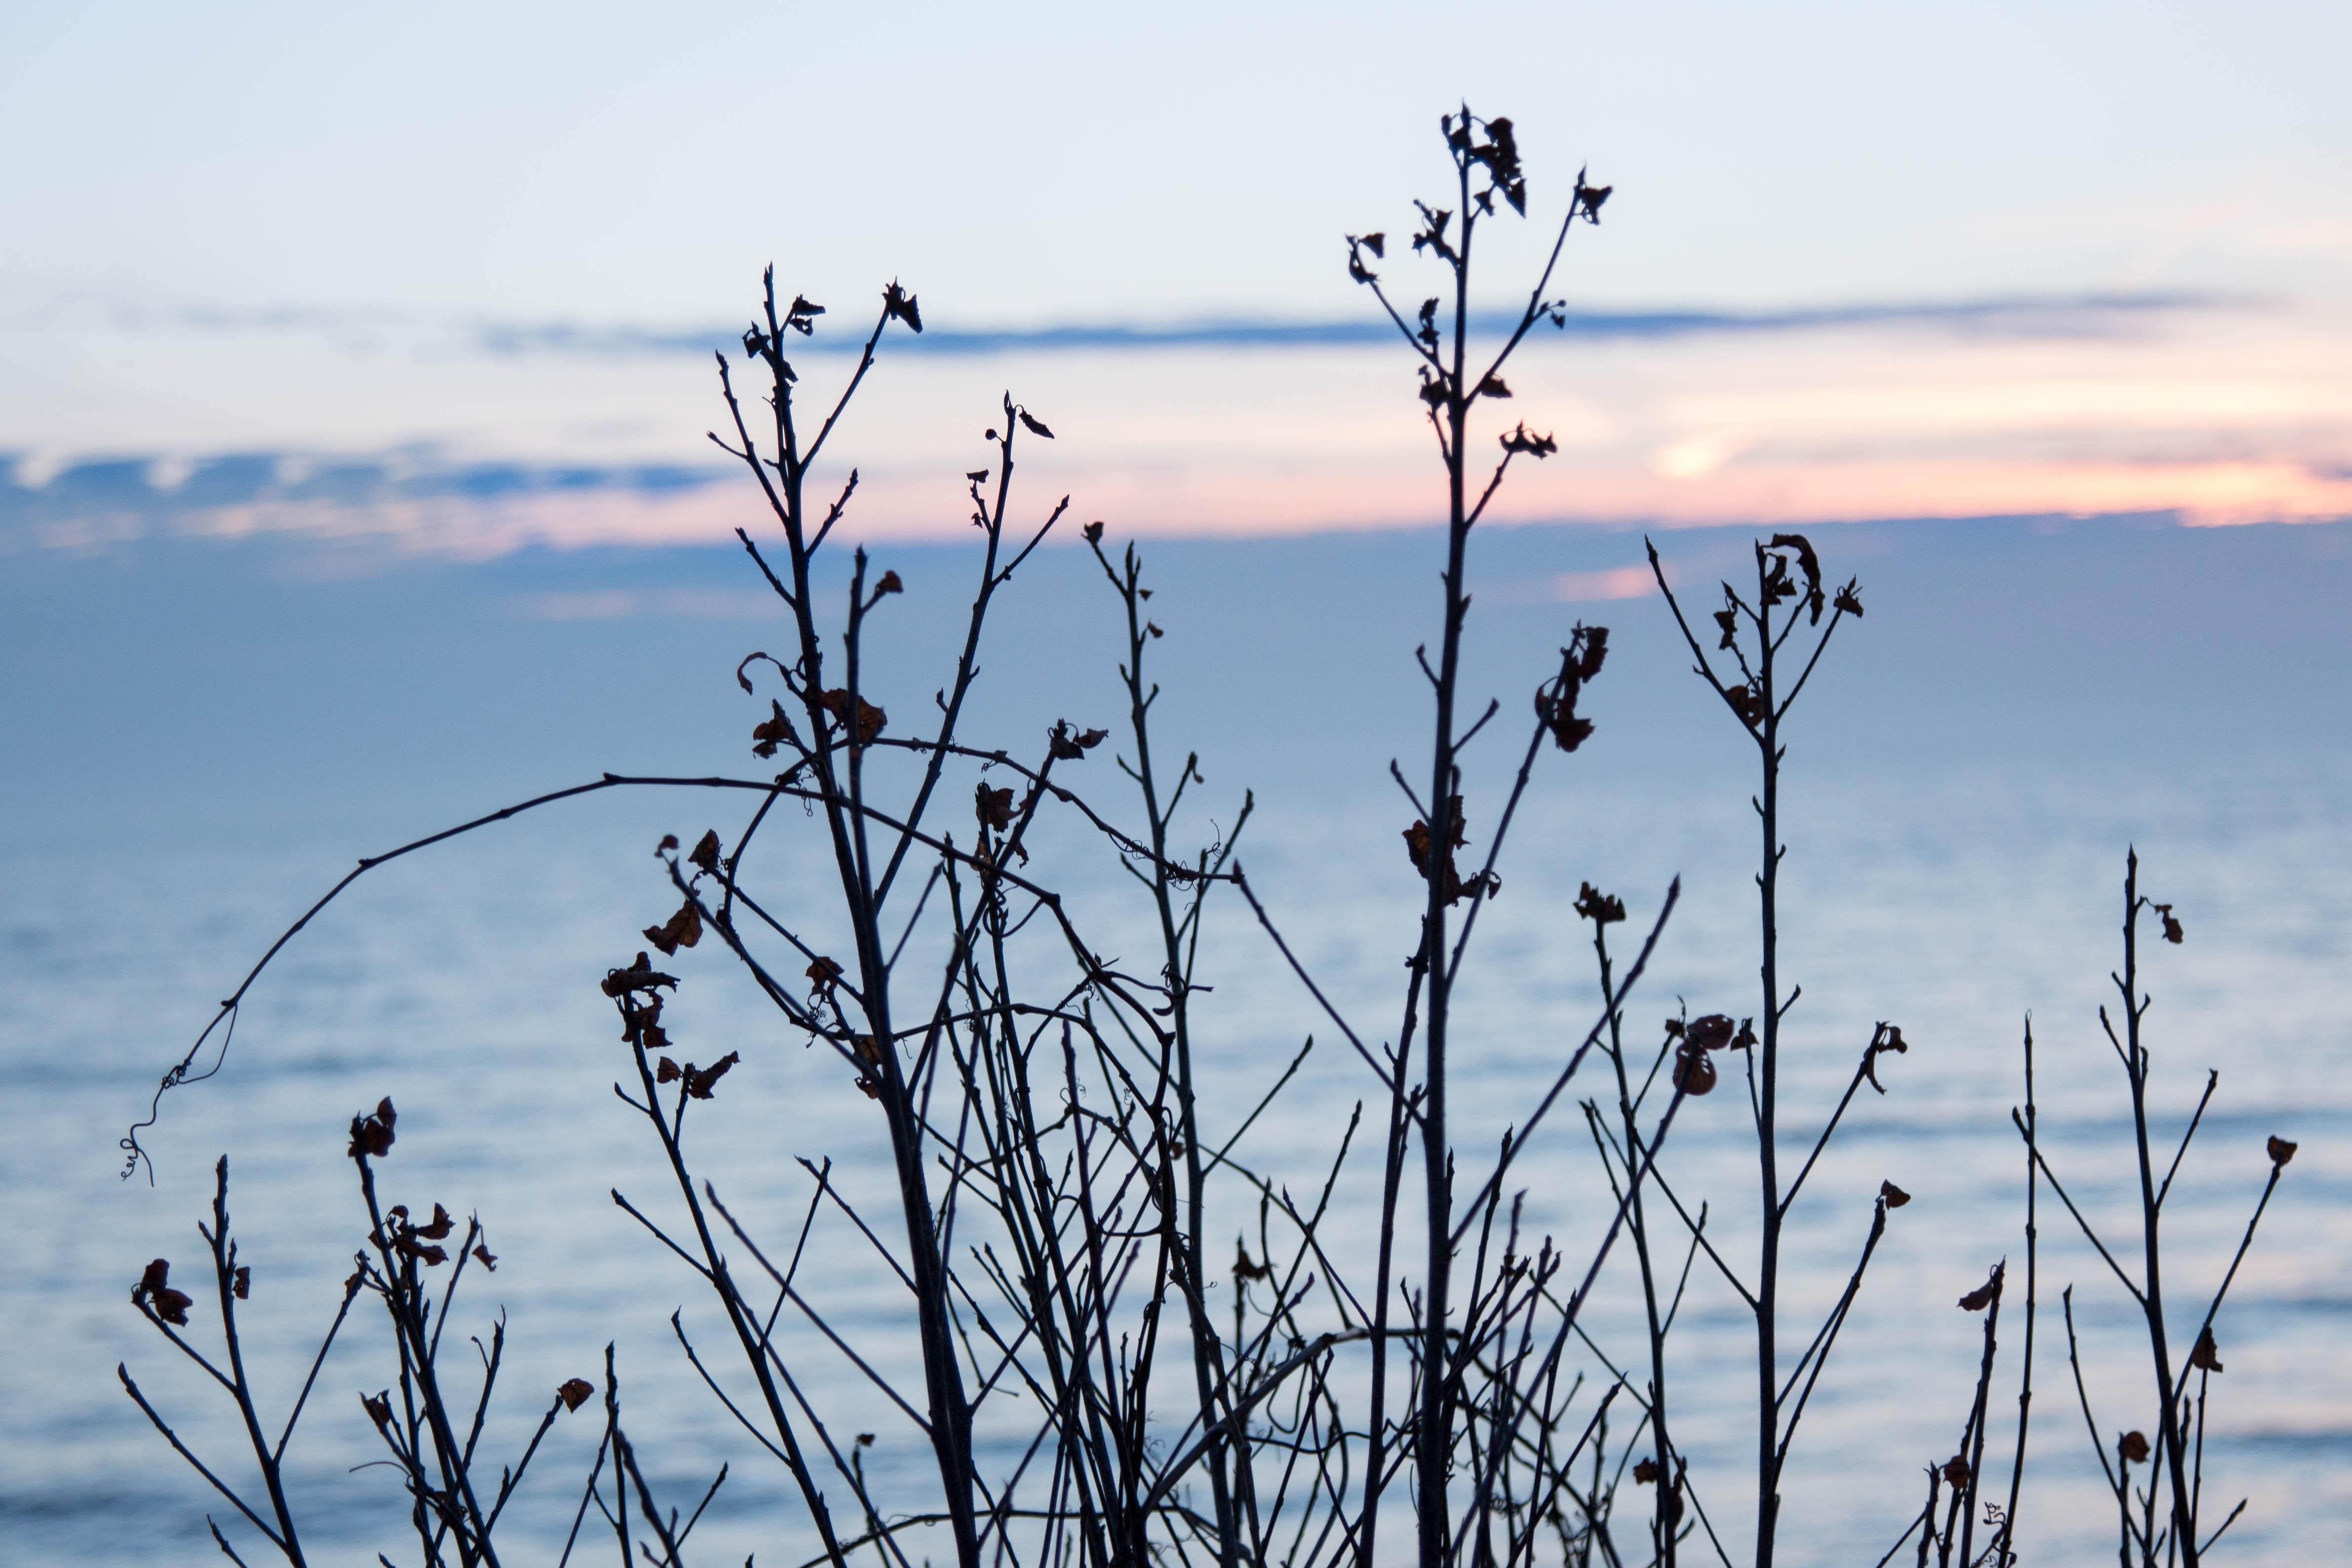 Sunrise over Lake Michigan February 2017 | https://www.roseclearfield.com